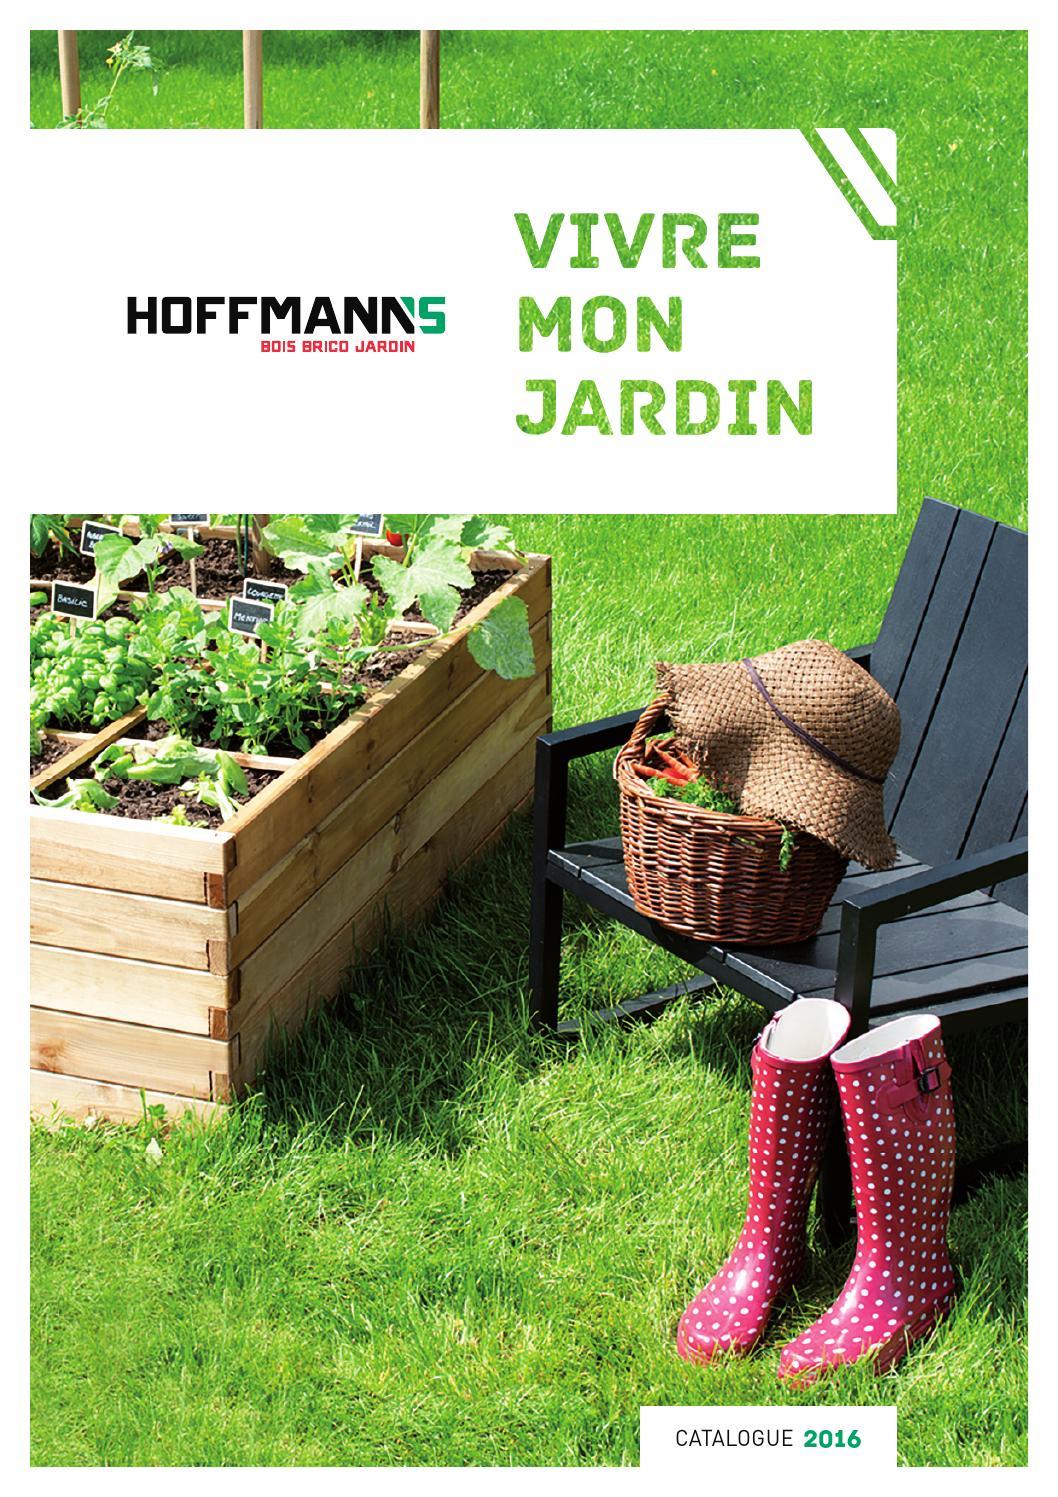 Bordure De Jardin Haut De Gamme De 3,20 M 320Cm Rouge ... concernant Bordure Jardin